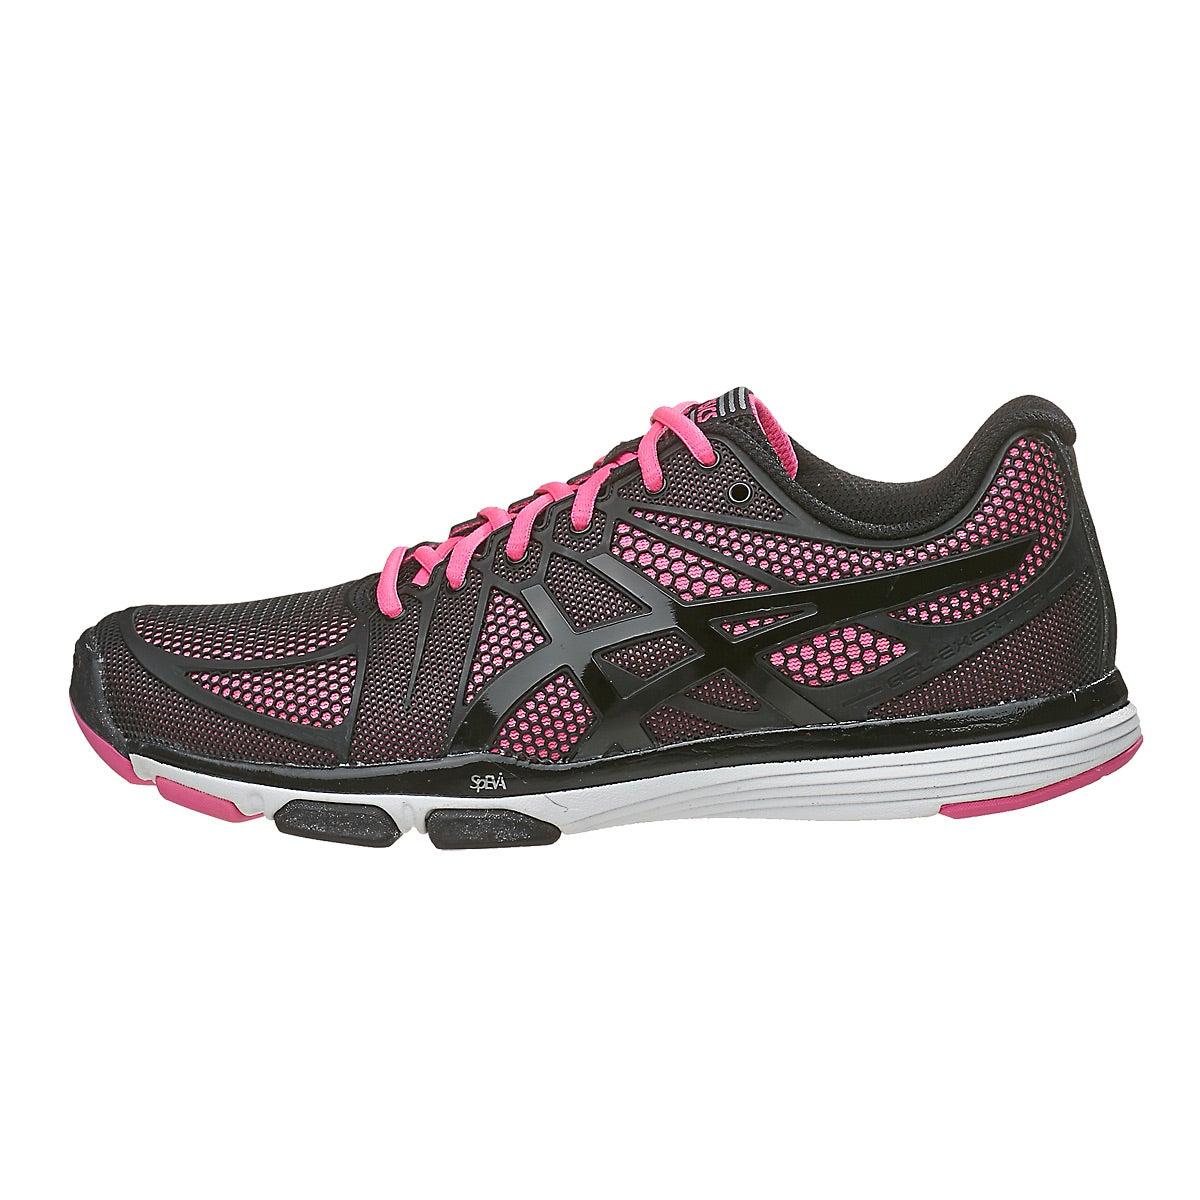 Asics Gel Exert TR Black/Pink Women's Shoes 360° View